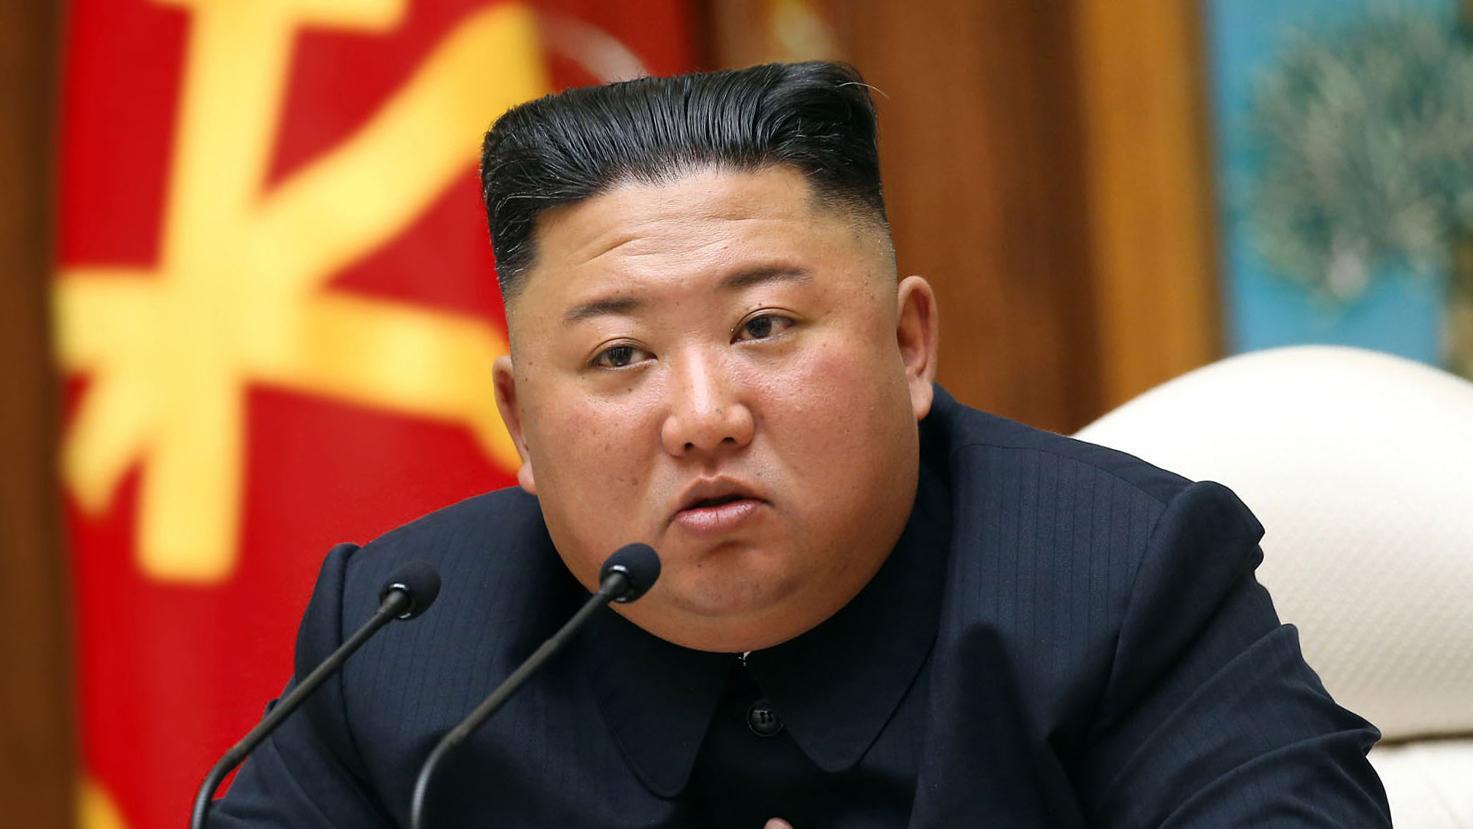 Nordkoreas Diktator Kim Jong-Un: Vermögen, Frau, Alter, Größe